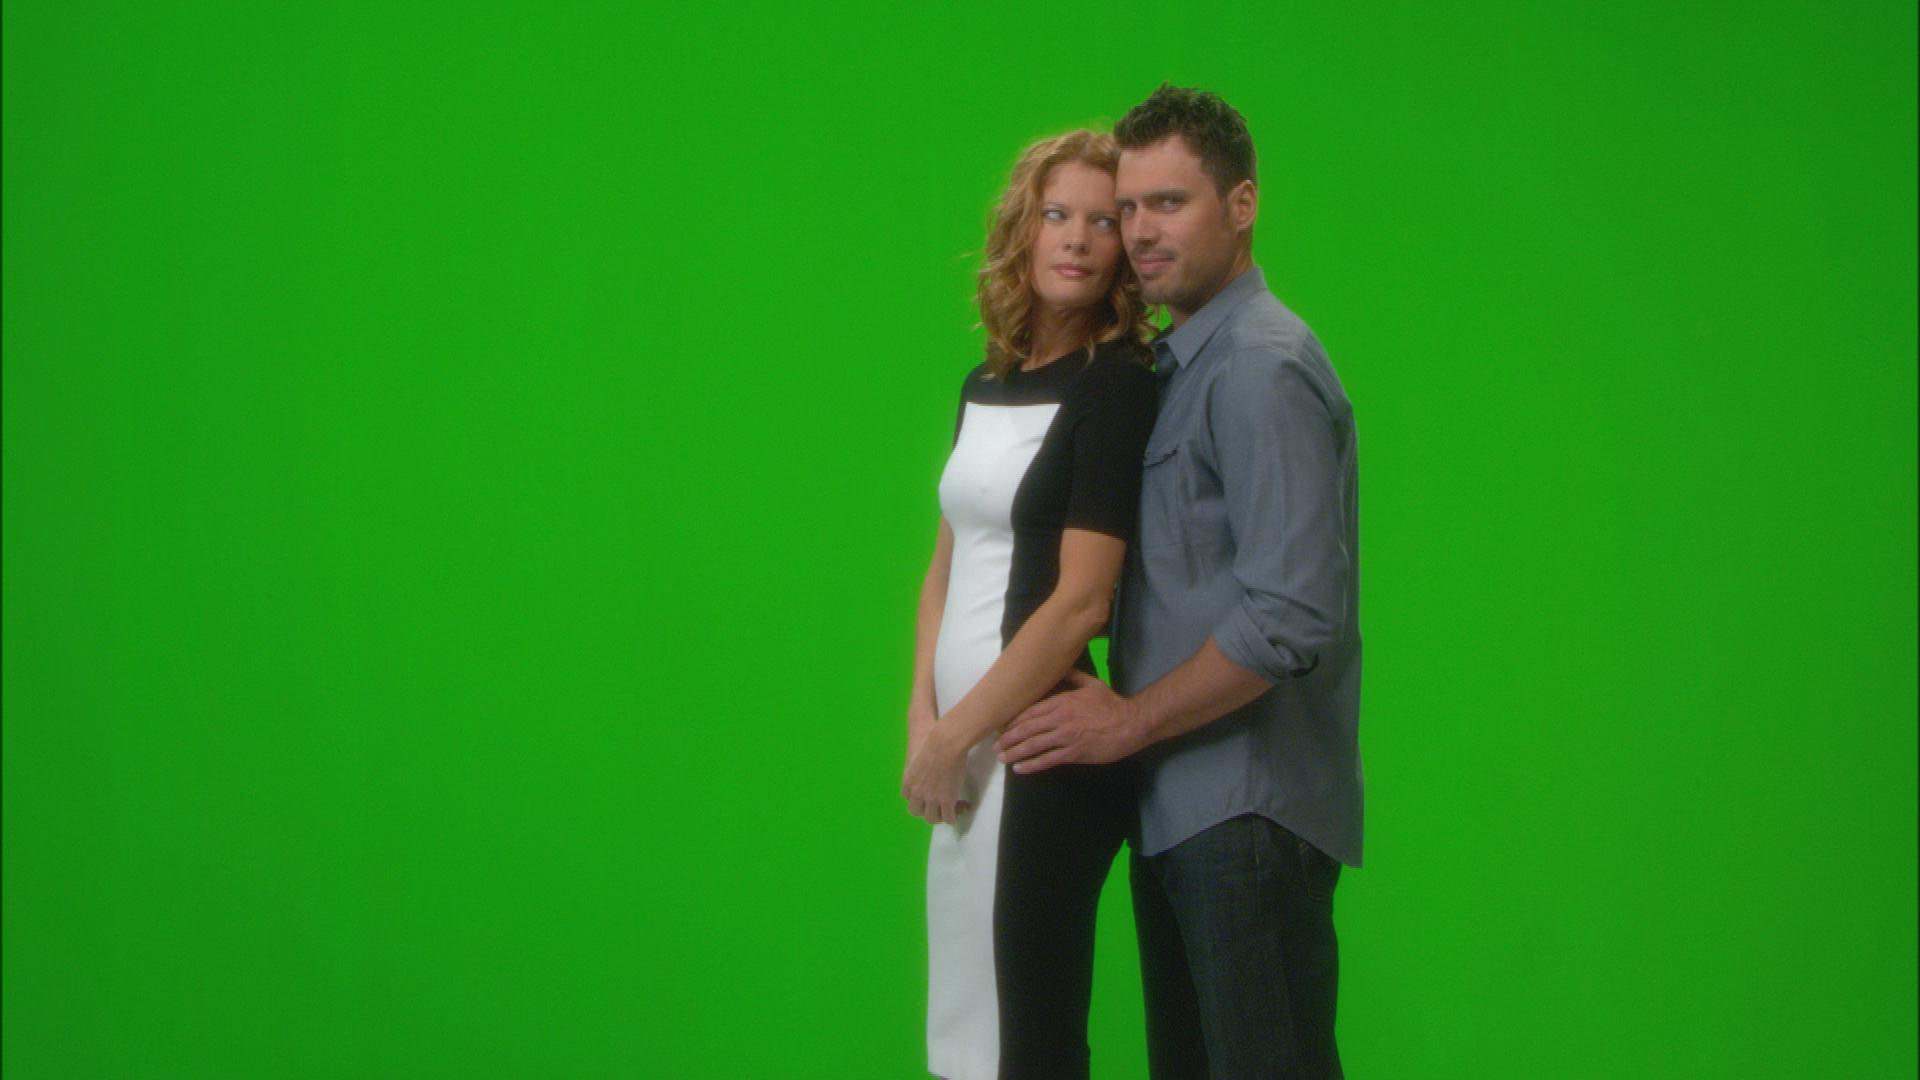 Joshua Morrow & Michelle Stafford